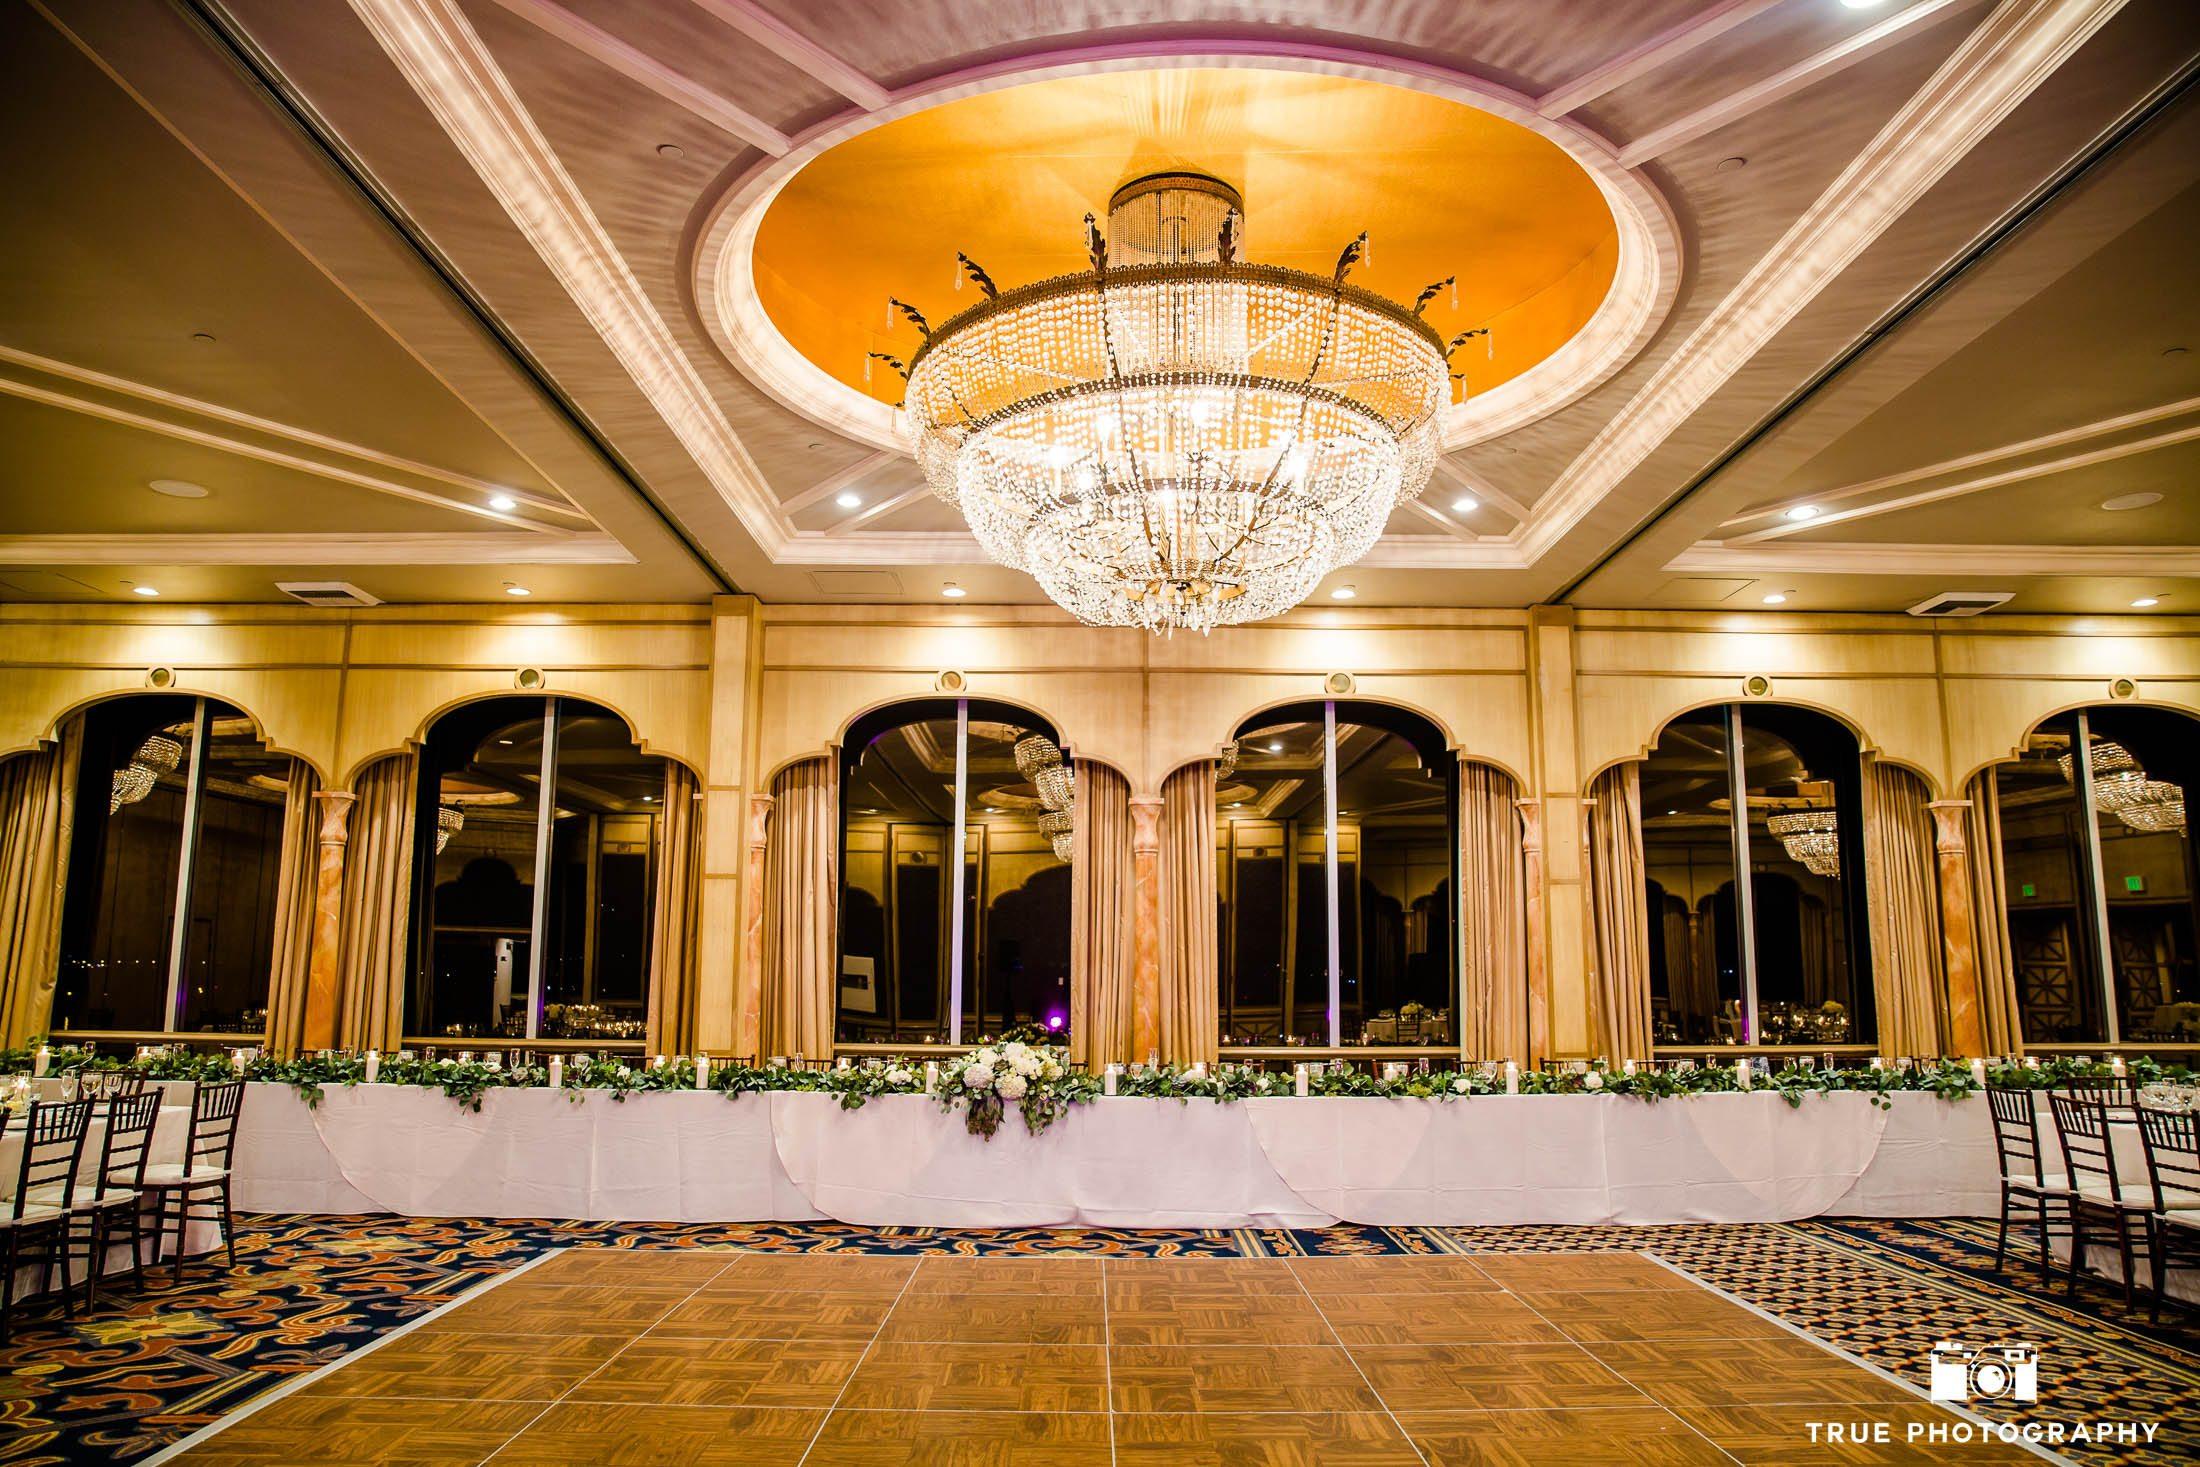 Grand chandelier below sweetheart table at reception in Bahia Resort